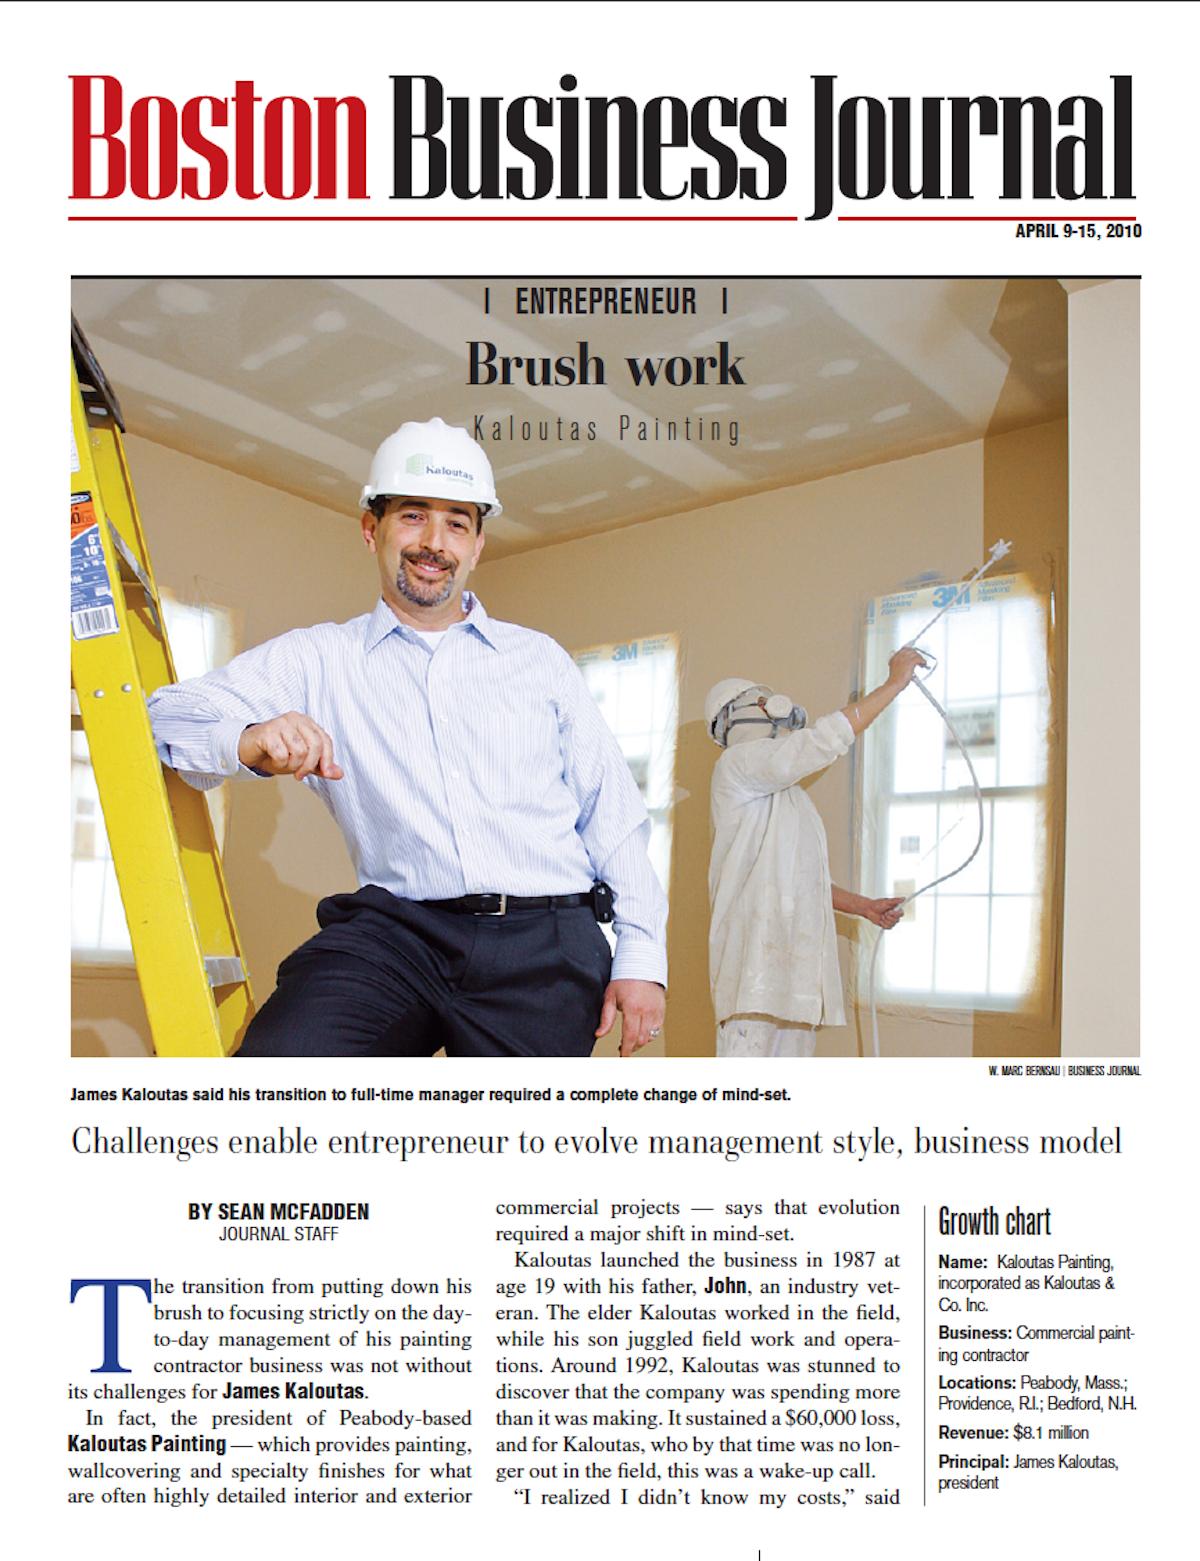 Boston Business Journal's Brush Work Article on Kaloutas